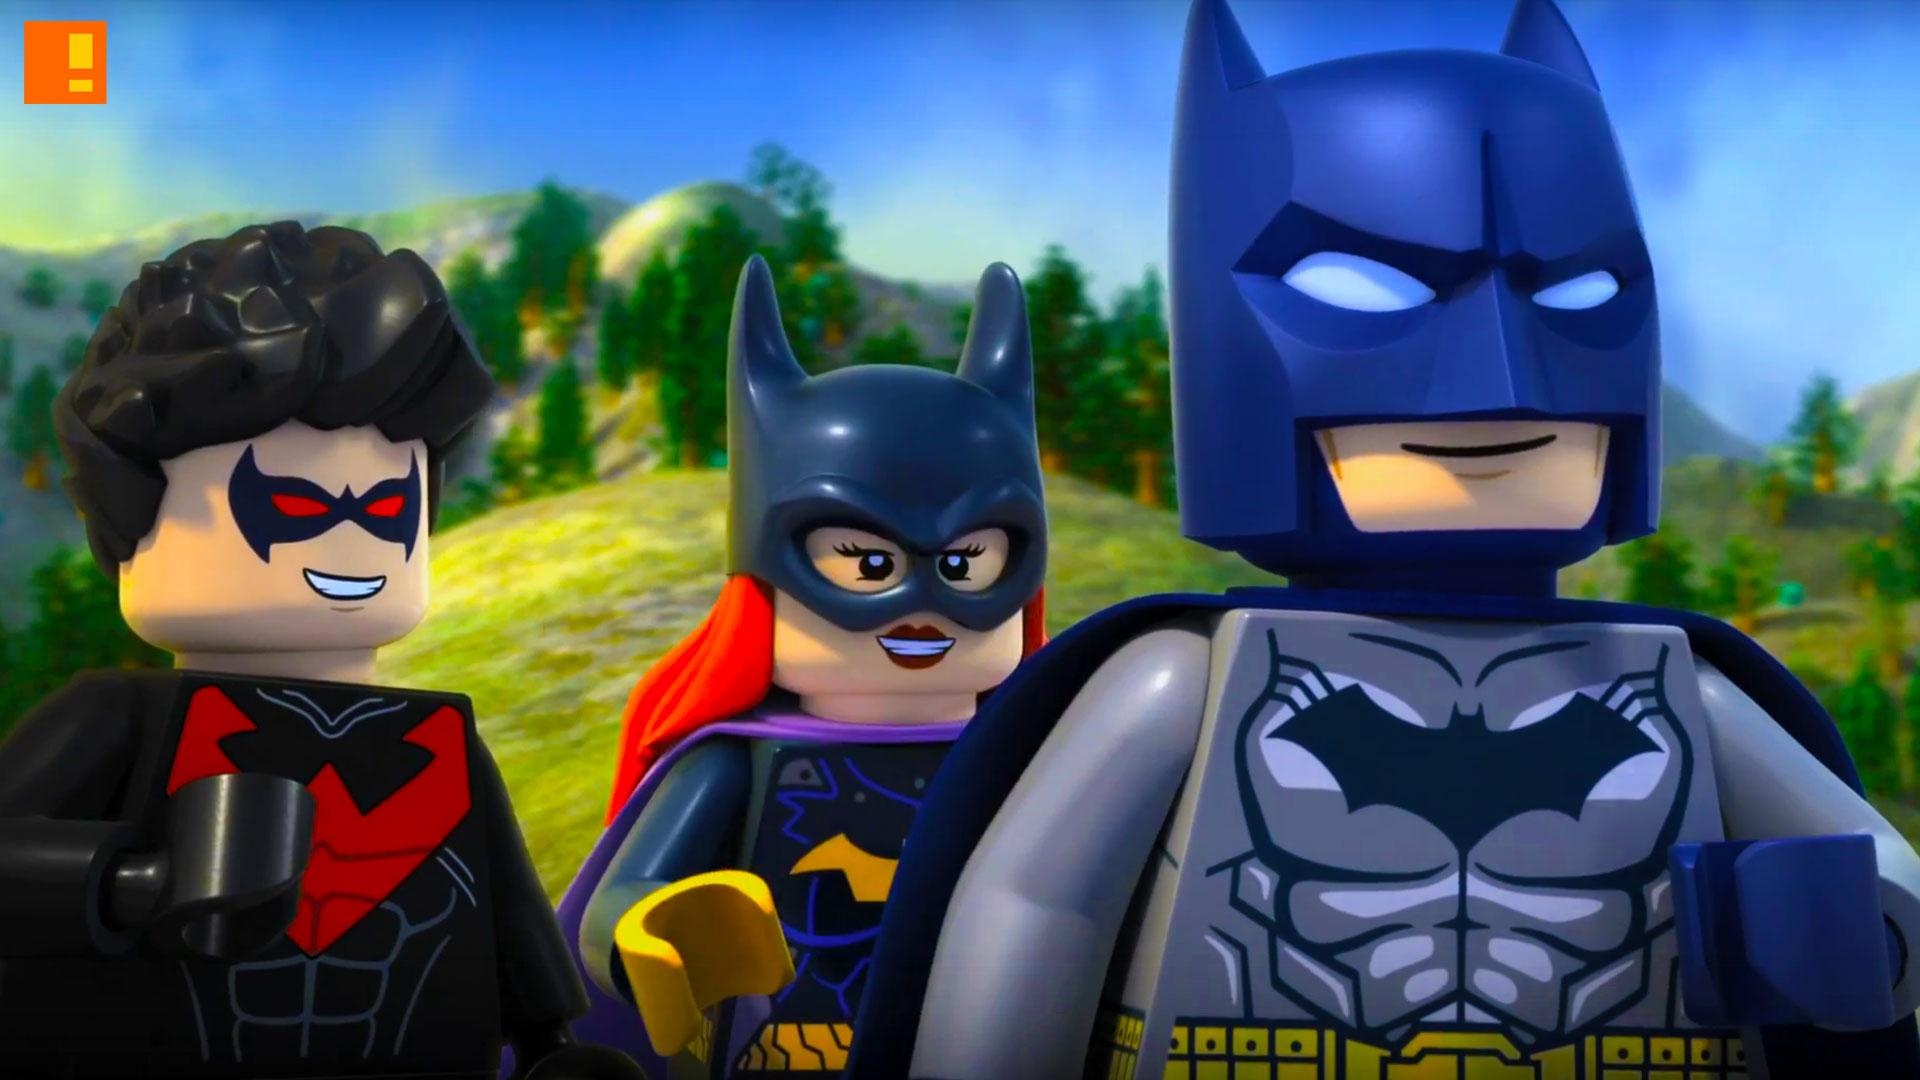 LEGO ,DC Comics, Super Heroes , Justice League, Gotham City Breakout, gotham, LEGO DC Comics Super Heroes - Justice League: Gotham City Breakout, batman, animation , warner animation, dc comics, batgirl, cyborg, superman, wonder woman, nightwing, robin, commissioner gordon, poison ivy, joker, the joker, arkham asylum, trailer,